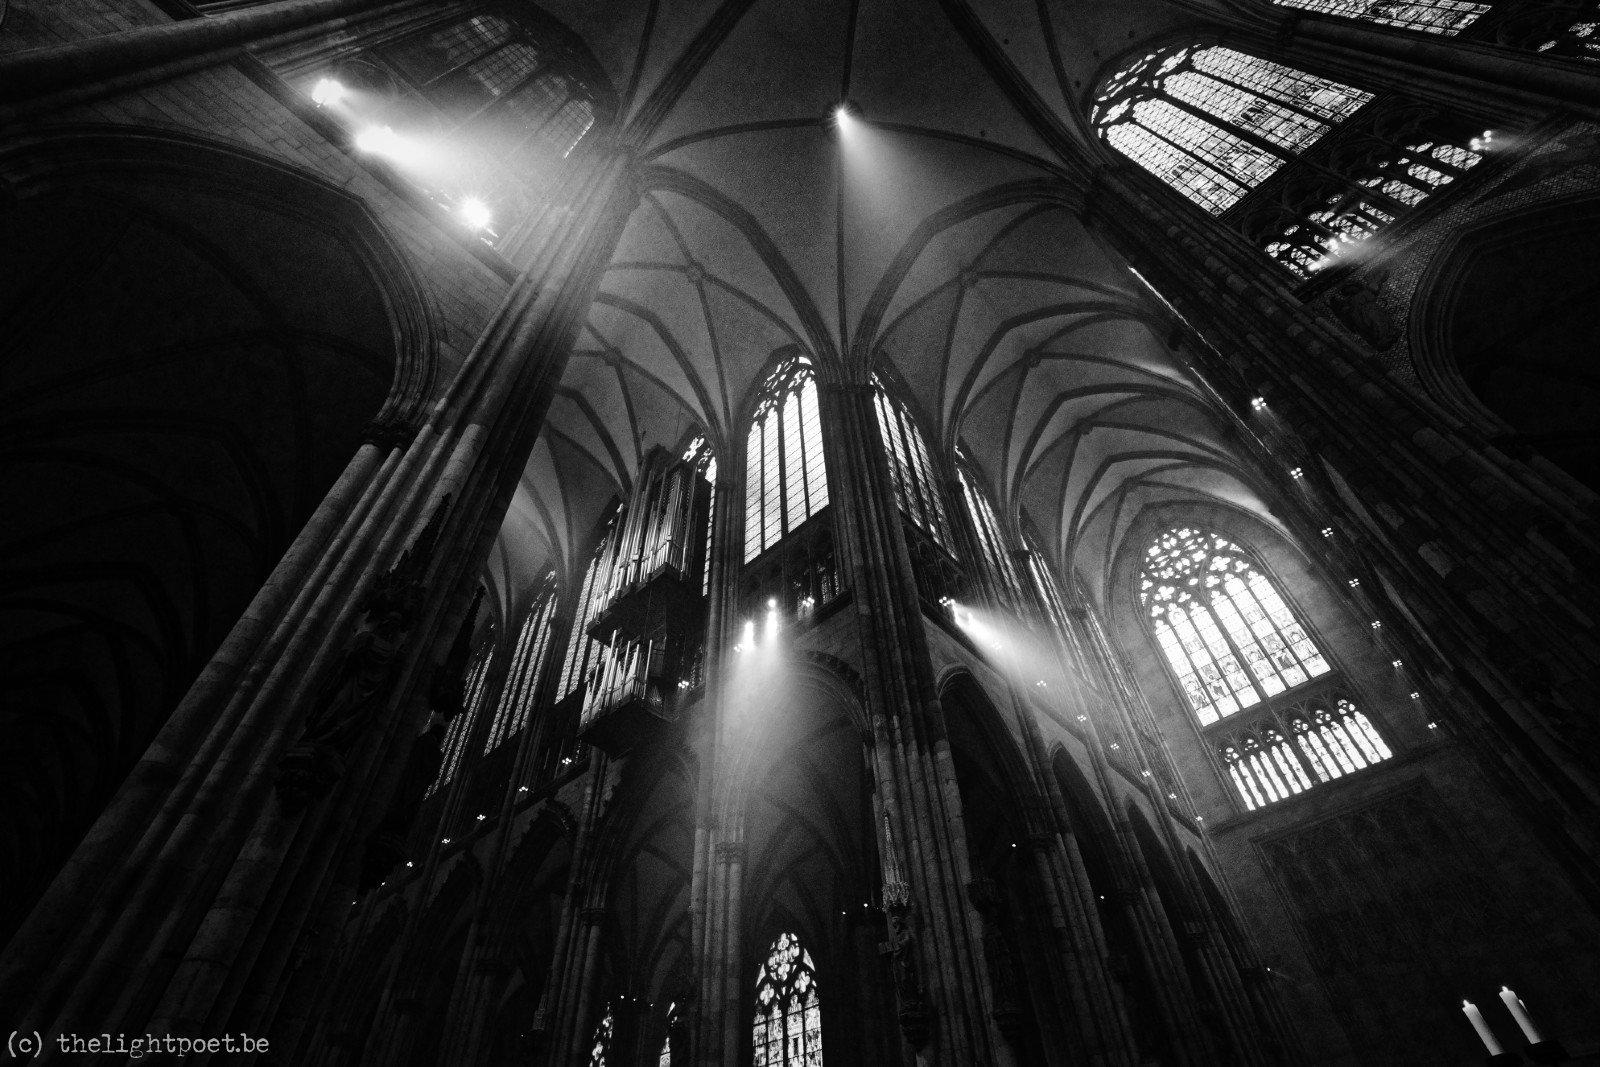 Cologne, December 2017